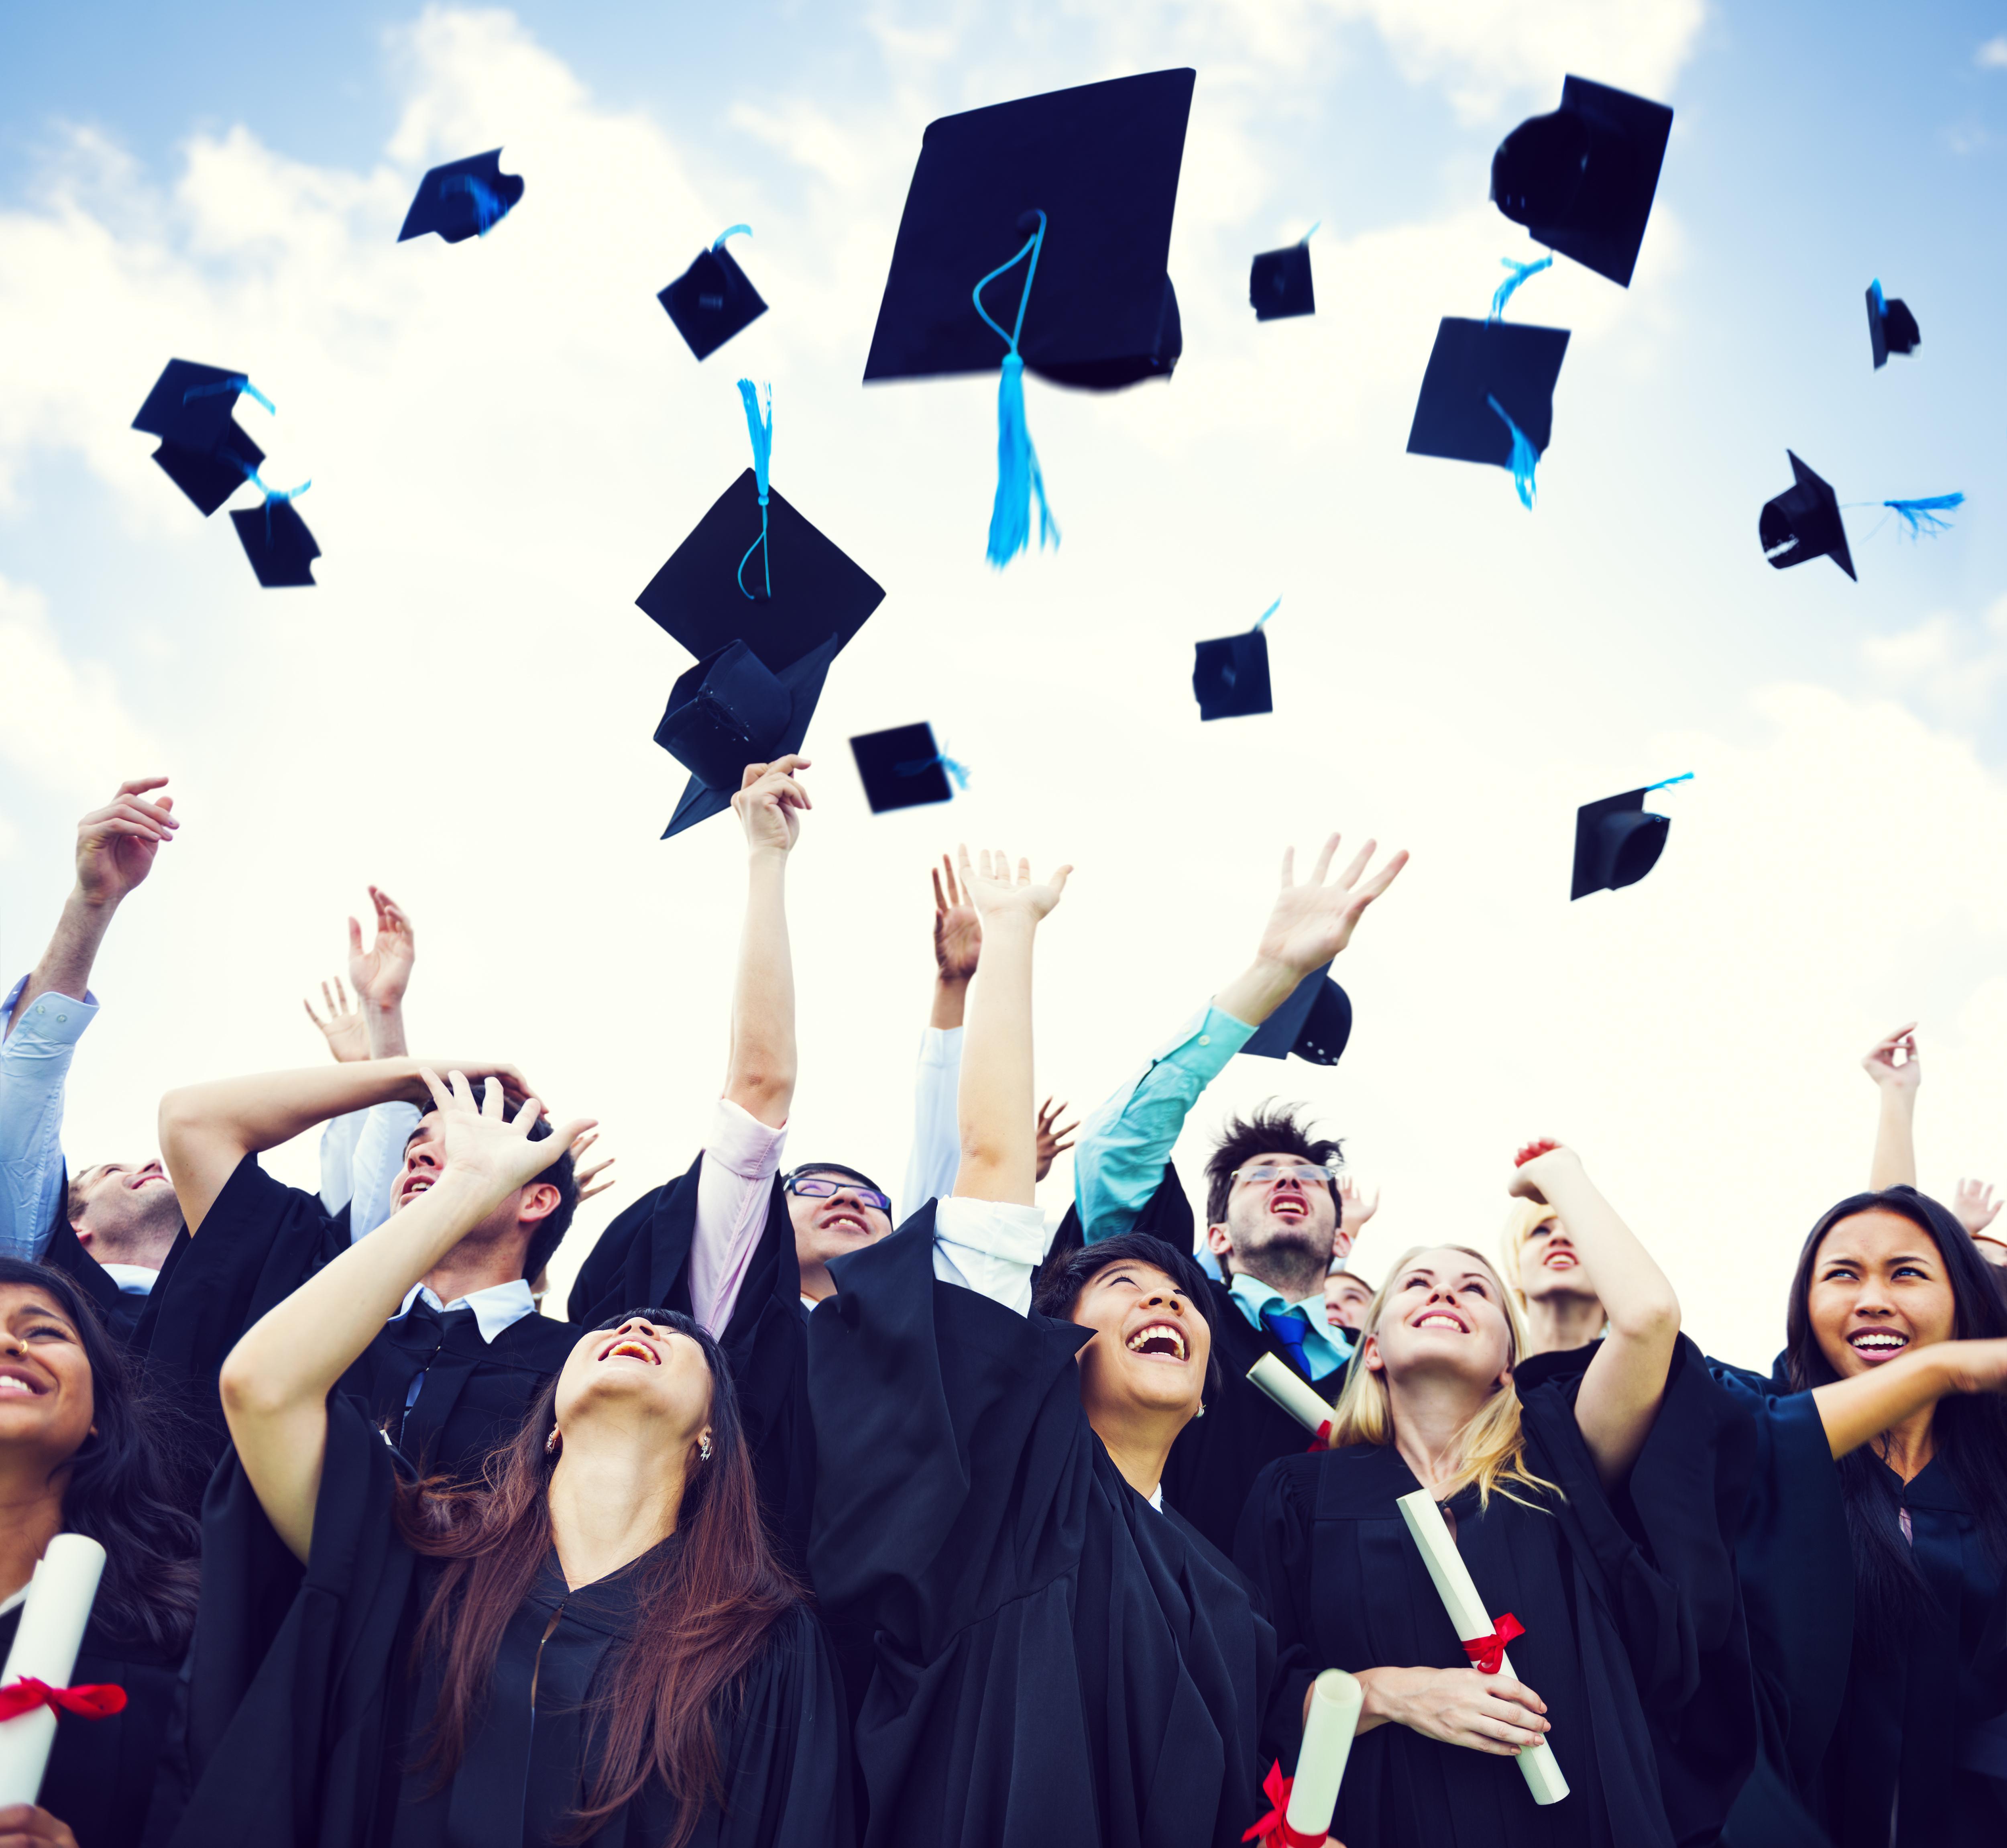 johor dt vs kelantan online dating: graduate student dating freshman year of college